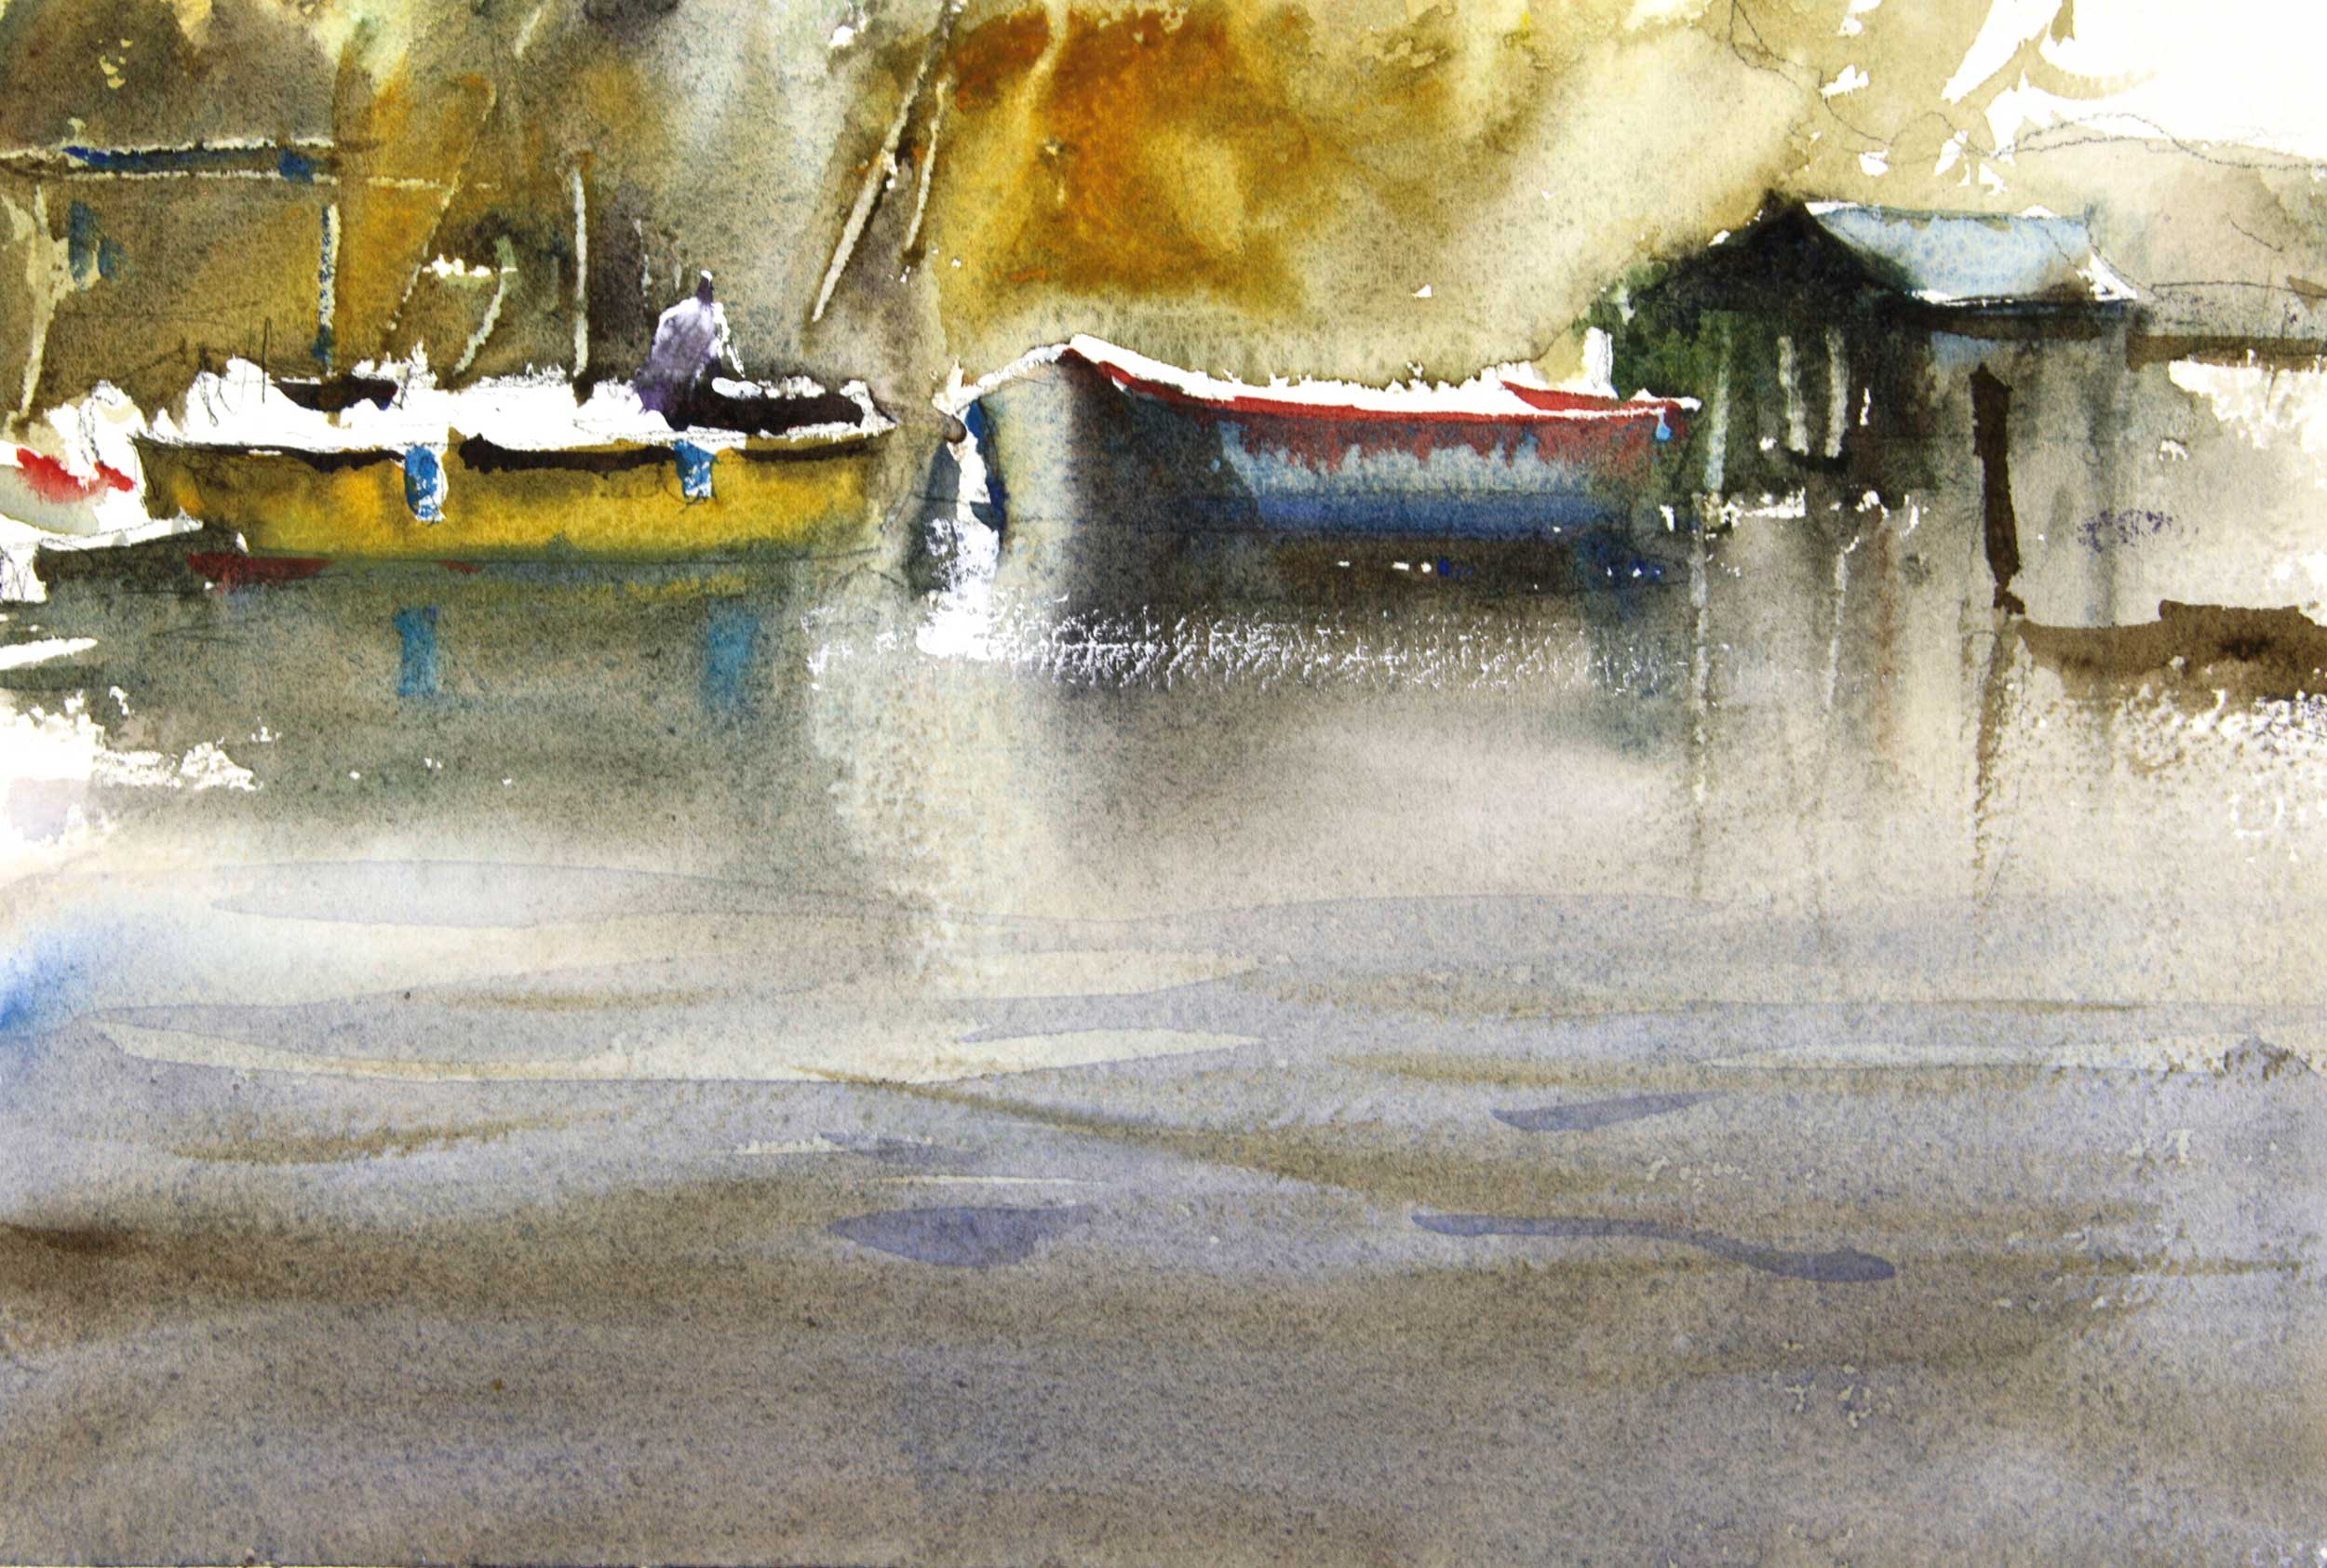 Thames, London 26 x 17 cm